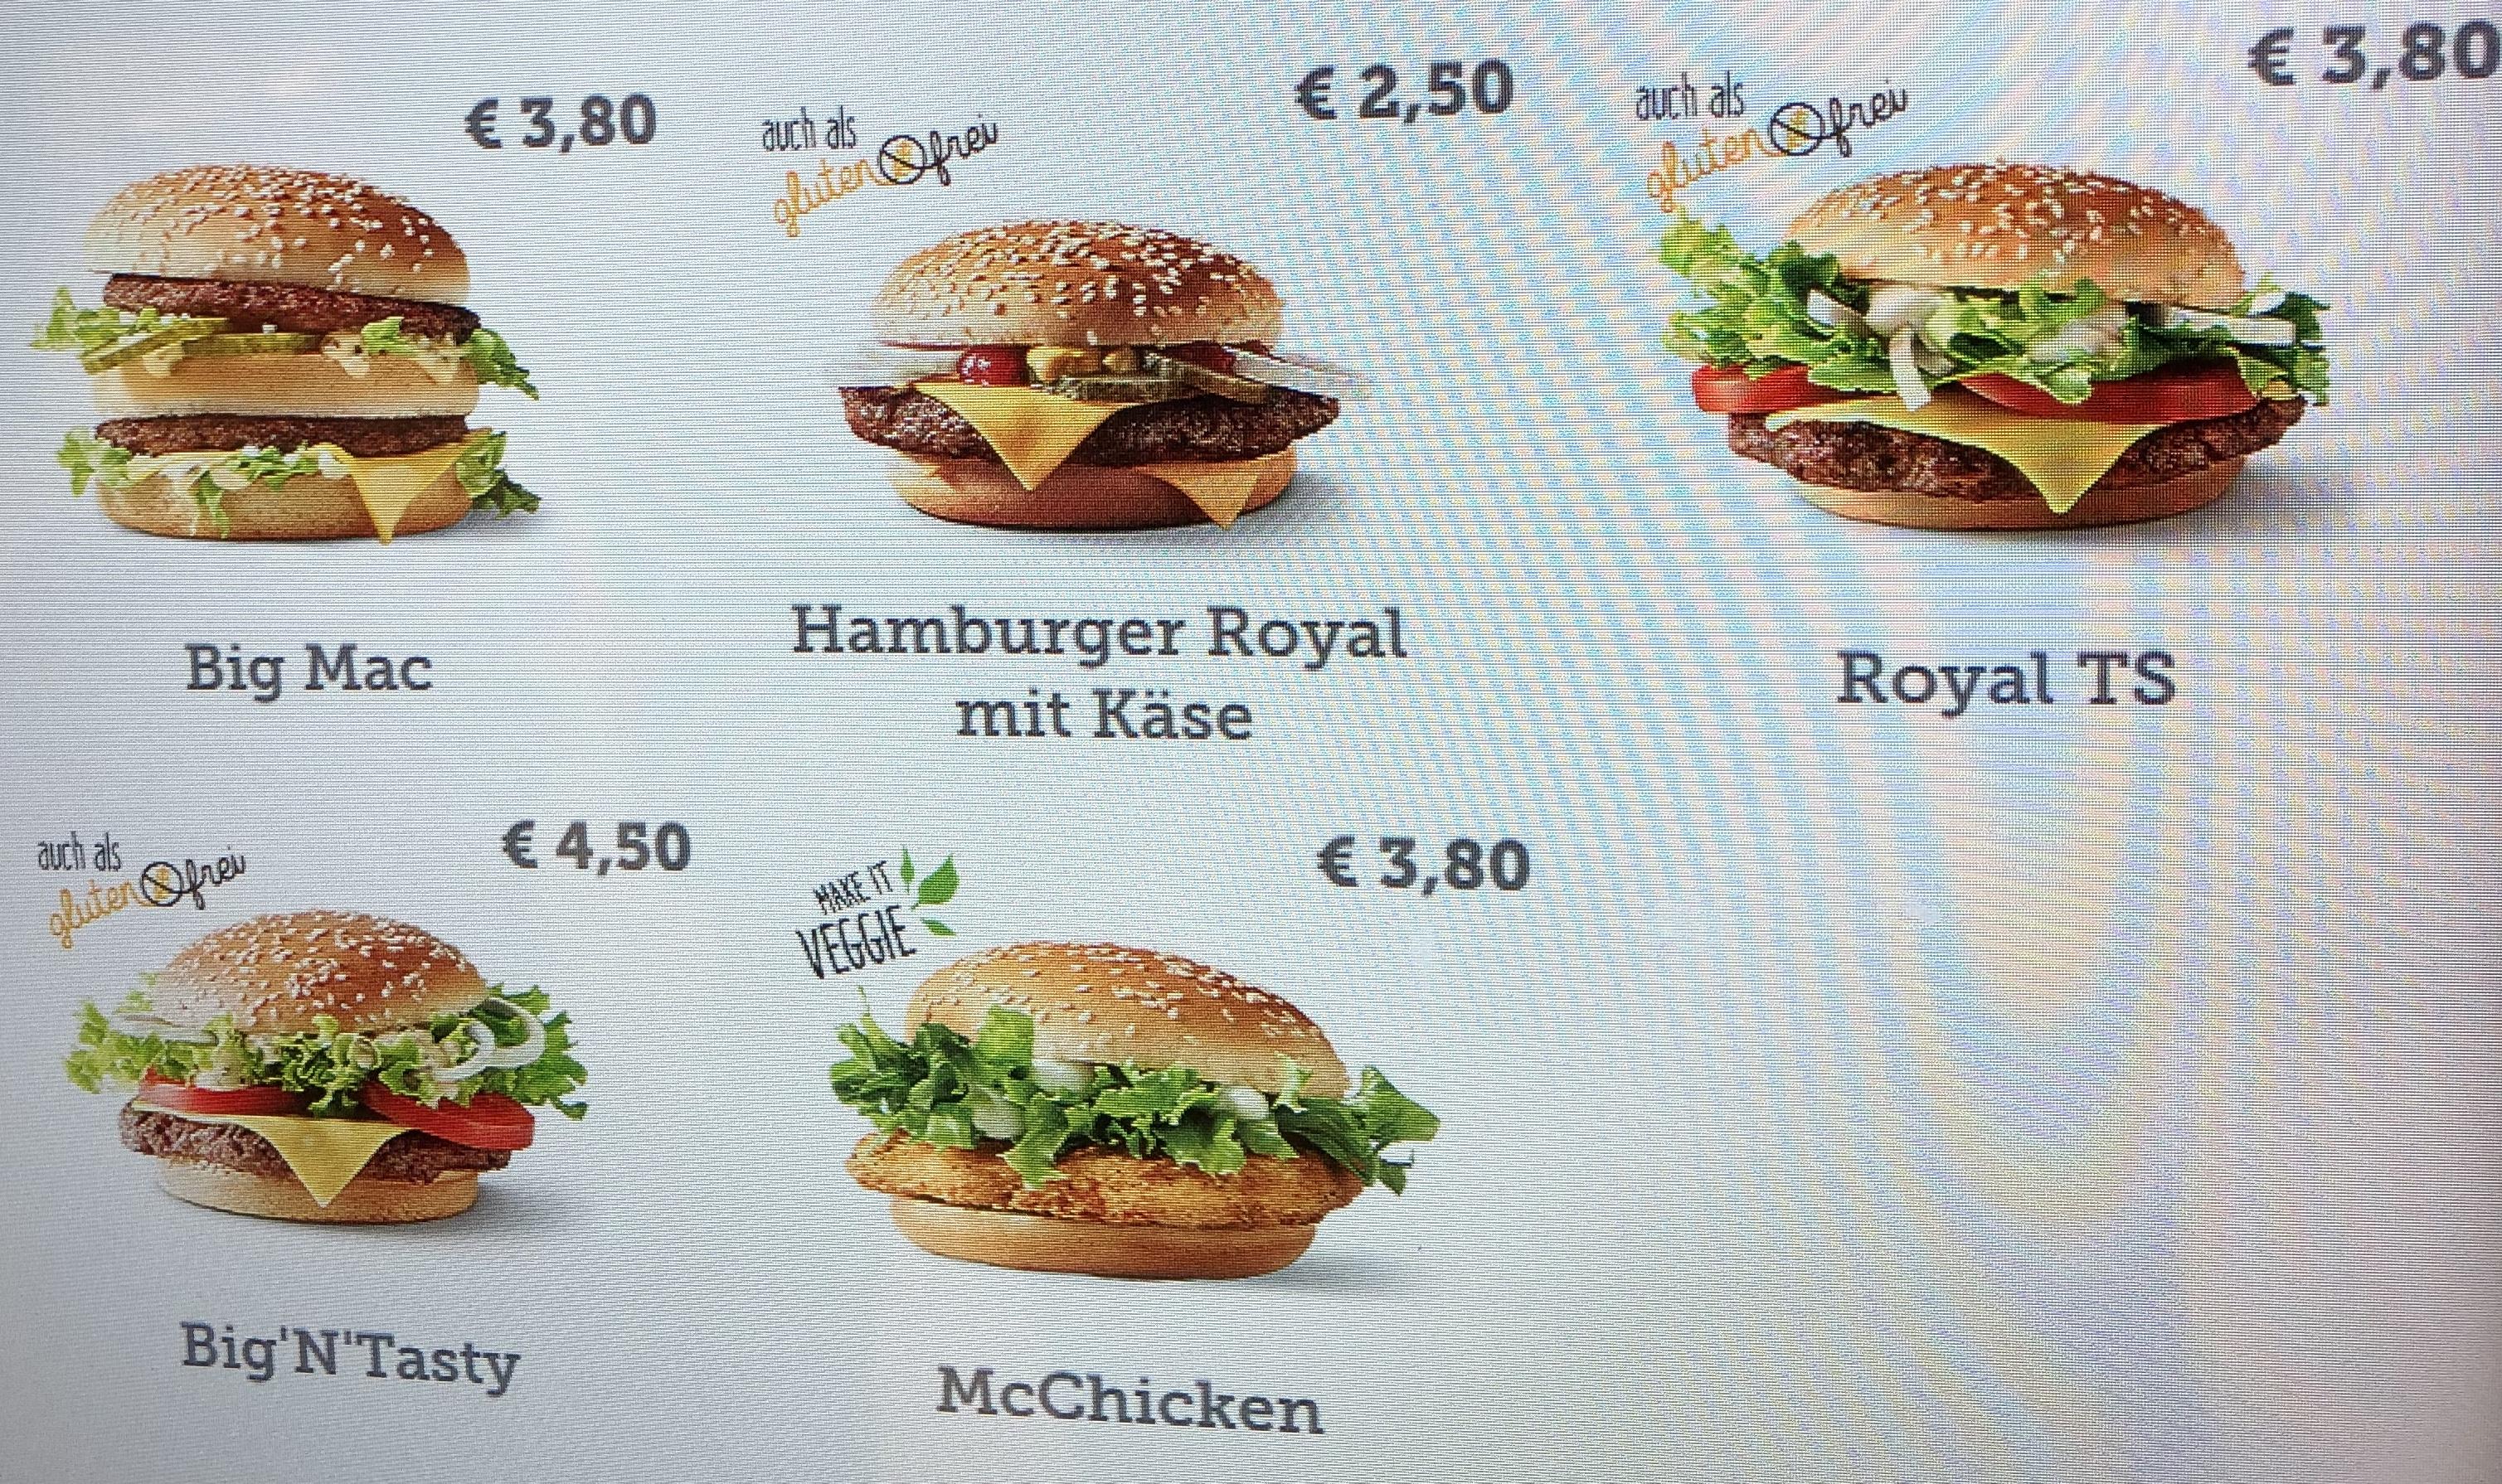 (lokal) McDonald's Wien Karlsplatz - Hamburger Royal